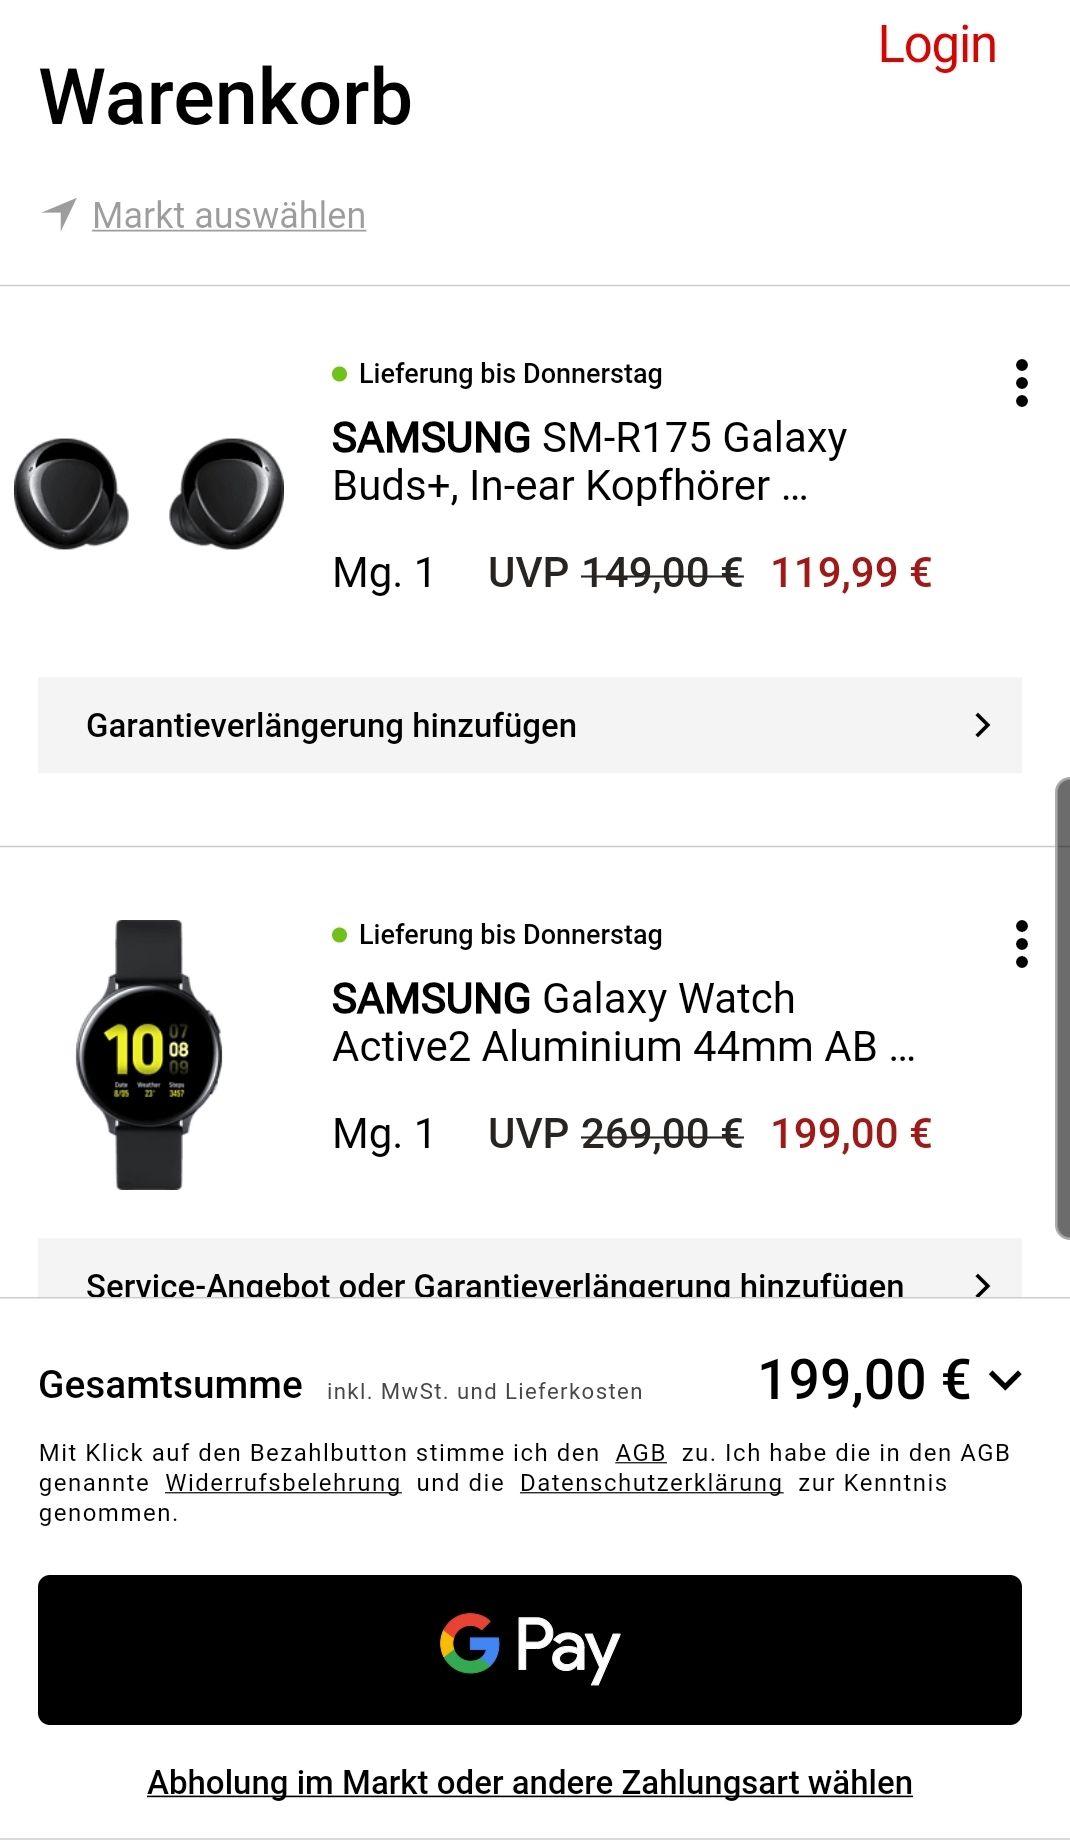 Samsung Galaxy watch active 2 + Galaxy buds plus